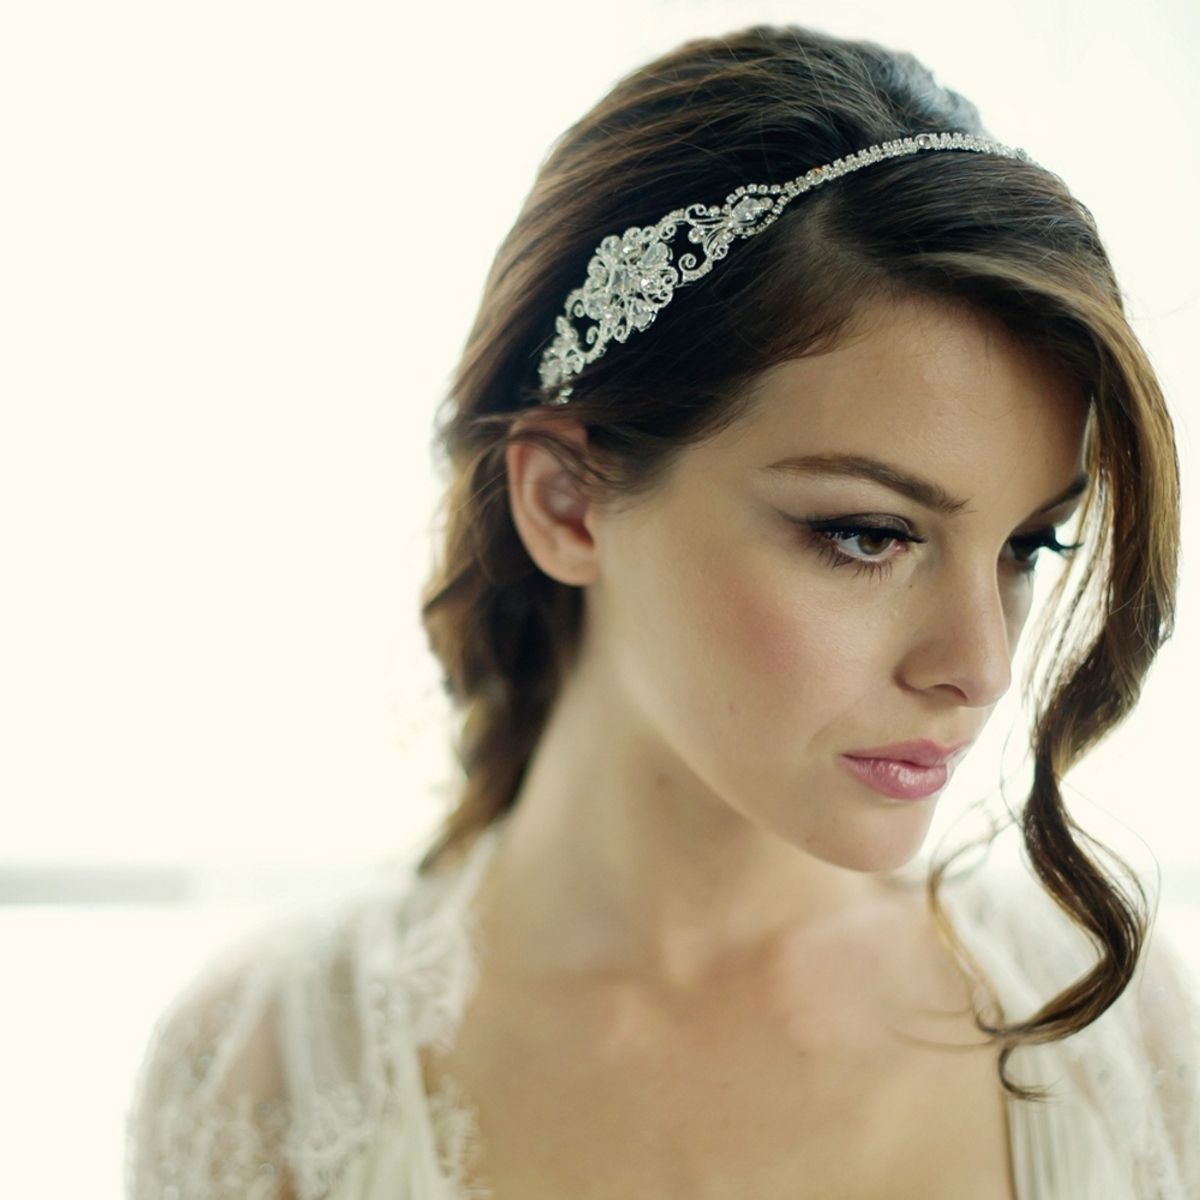 Hair accessories headbands uk - Aye Do Ltd Beatrice Bridal Side Tiara Hdb5 Awj 75 00 Taupe Weddingpurple Weddingbridal Headbandsbridal Hair Accessoriescrystal